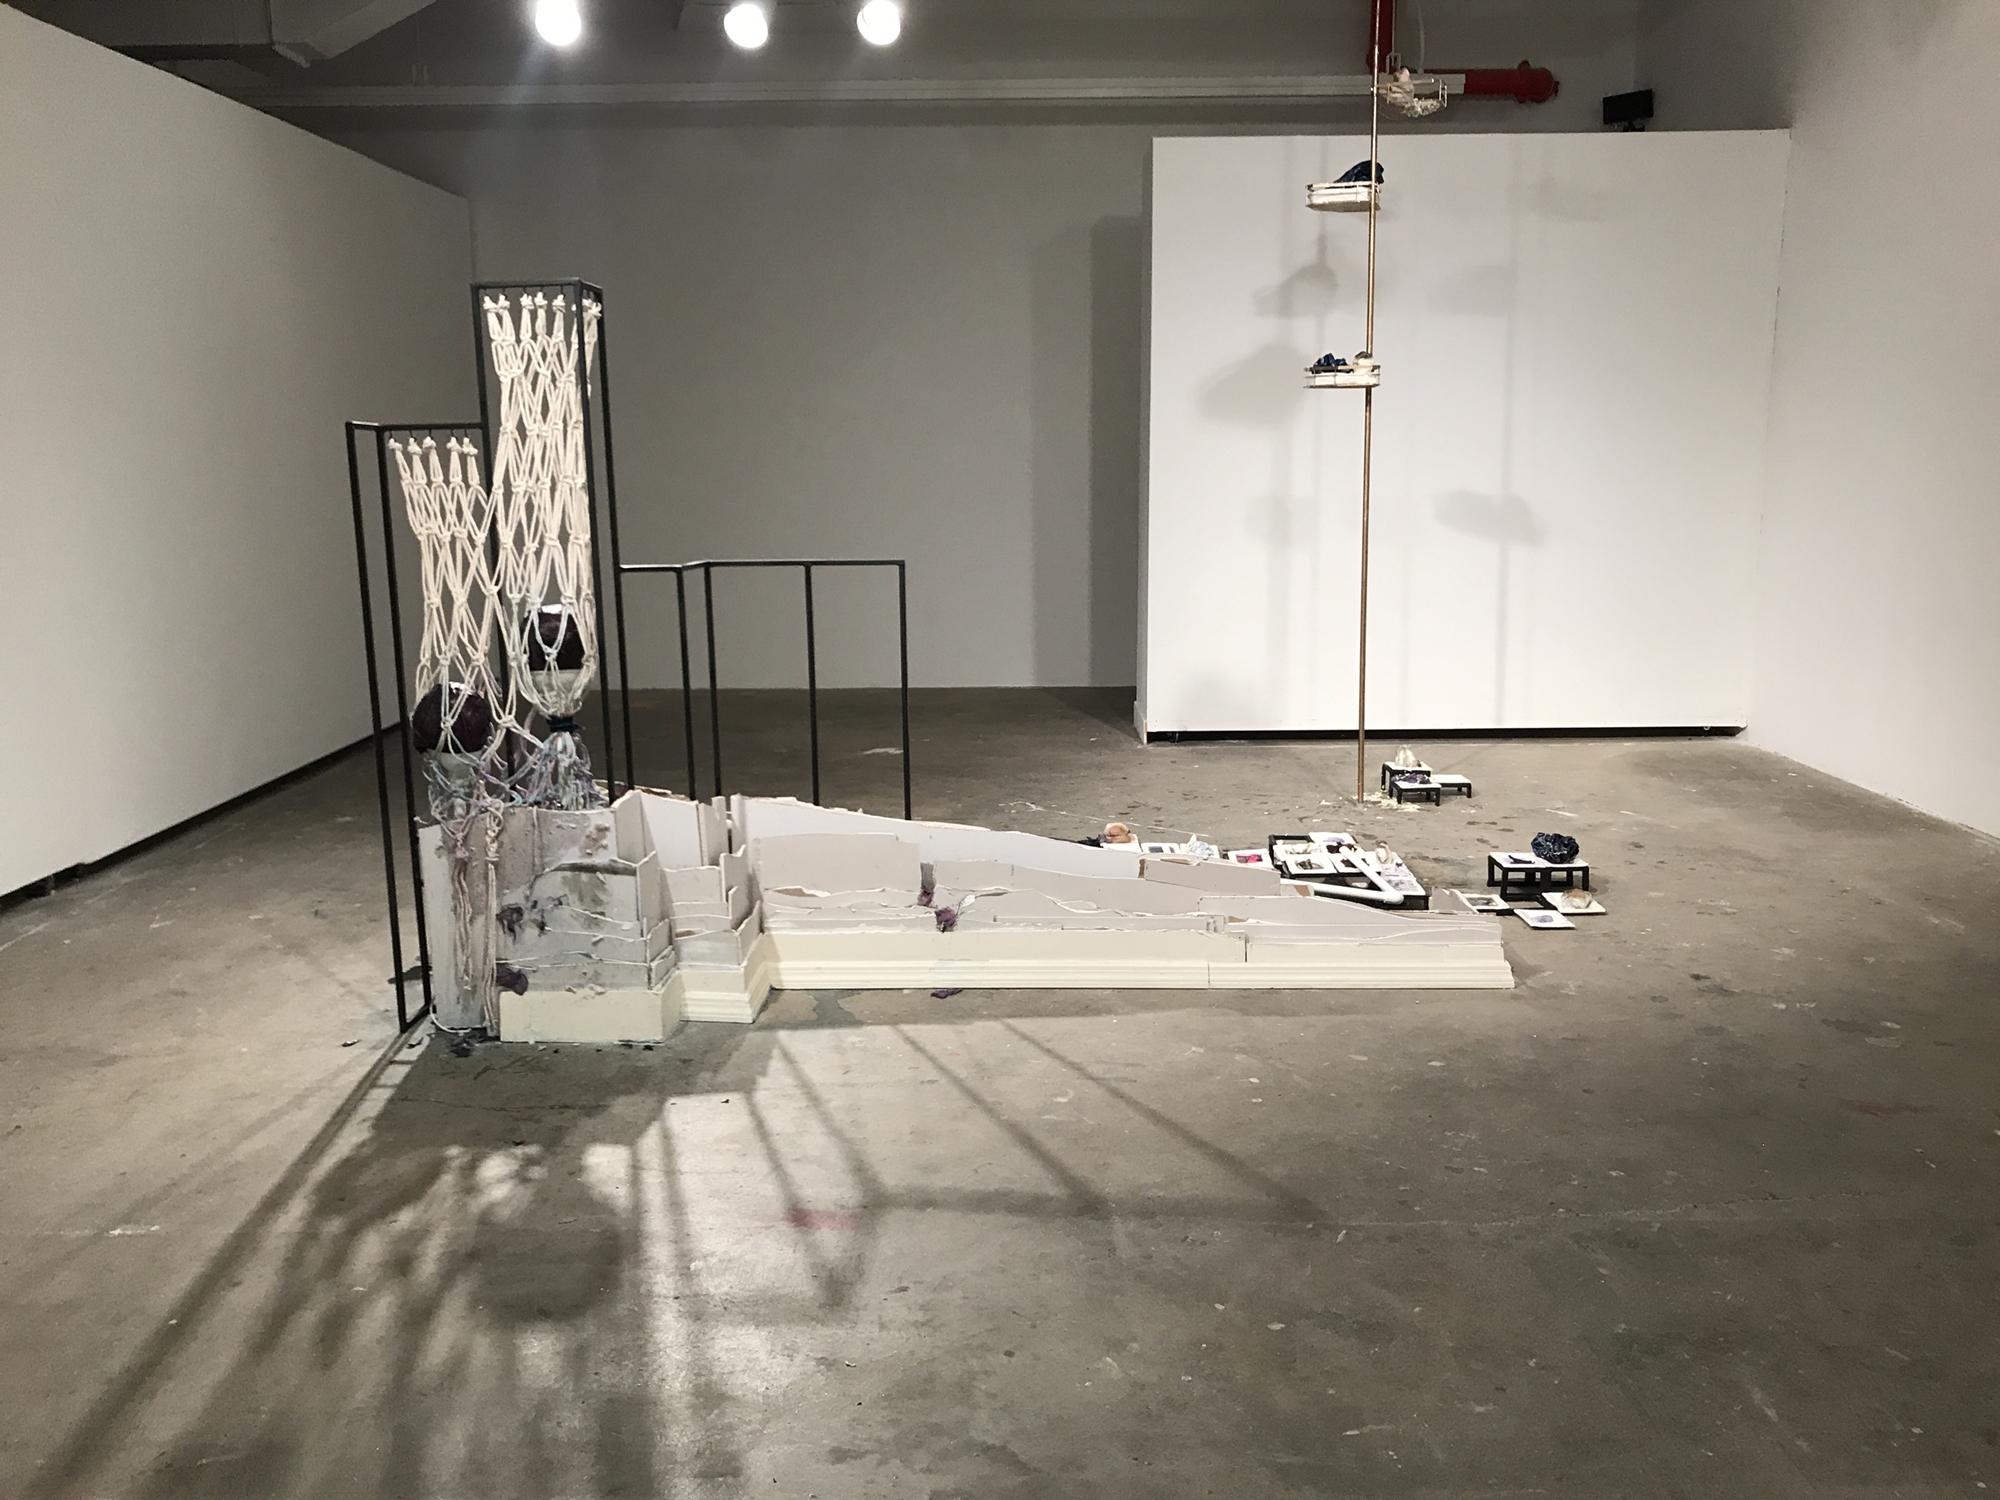 Jason Rondinelli Thesis Image